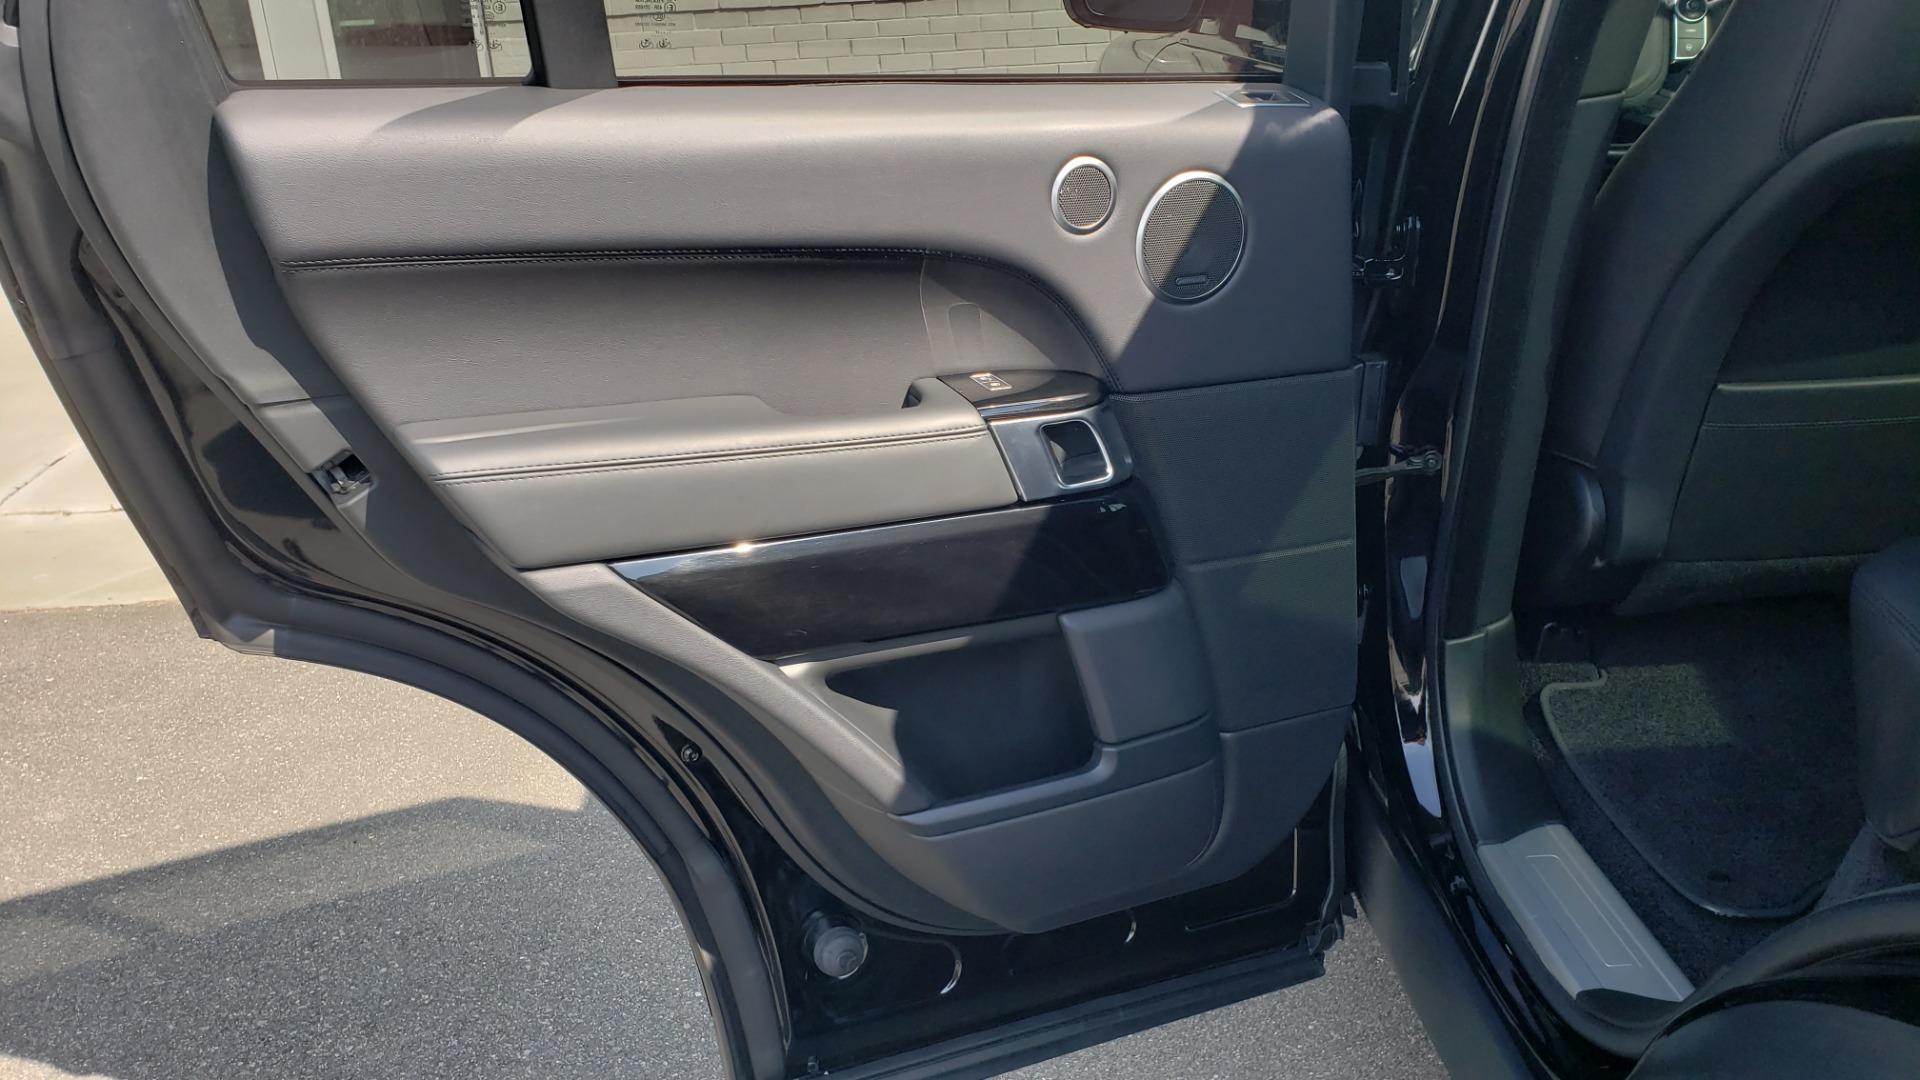 Used 2017 Land Rover RANGE ROVER SC V8 / VISION ASST / DRIVE PKG / MERIDIAN SOUND / PANO-ROOF / NAV / BSM for sale $75,995 at Formula Imports in Charlotte NC 28227 66